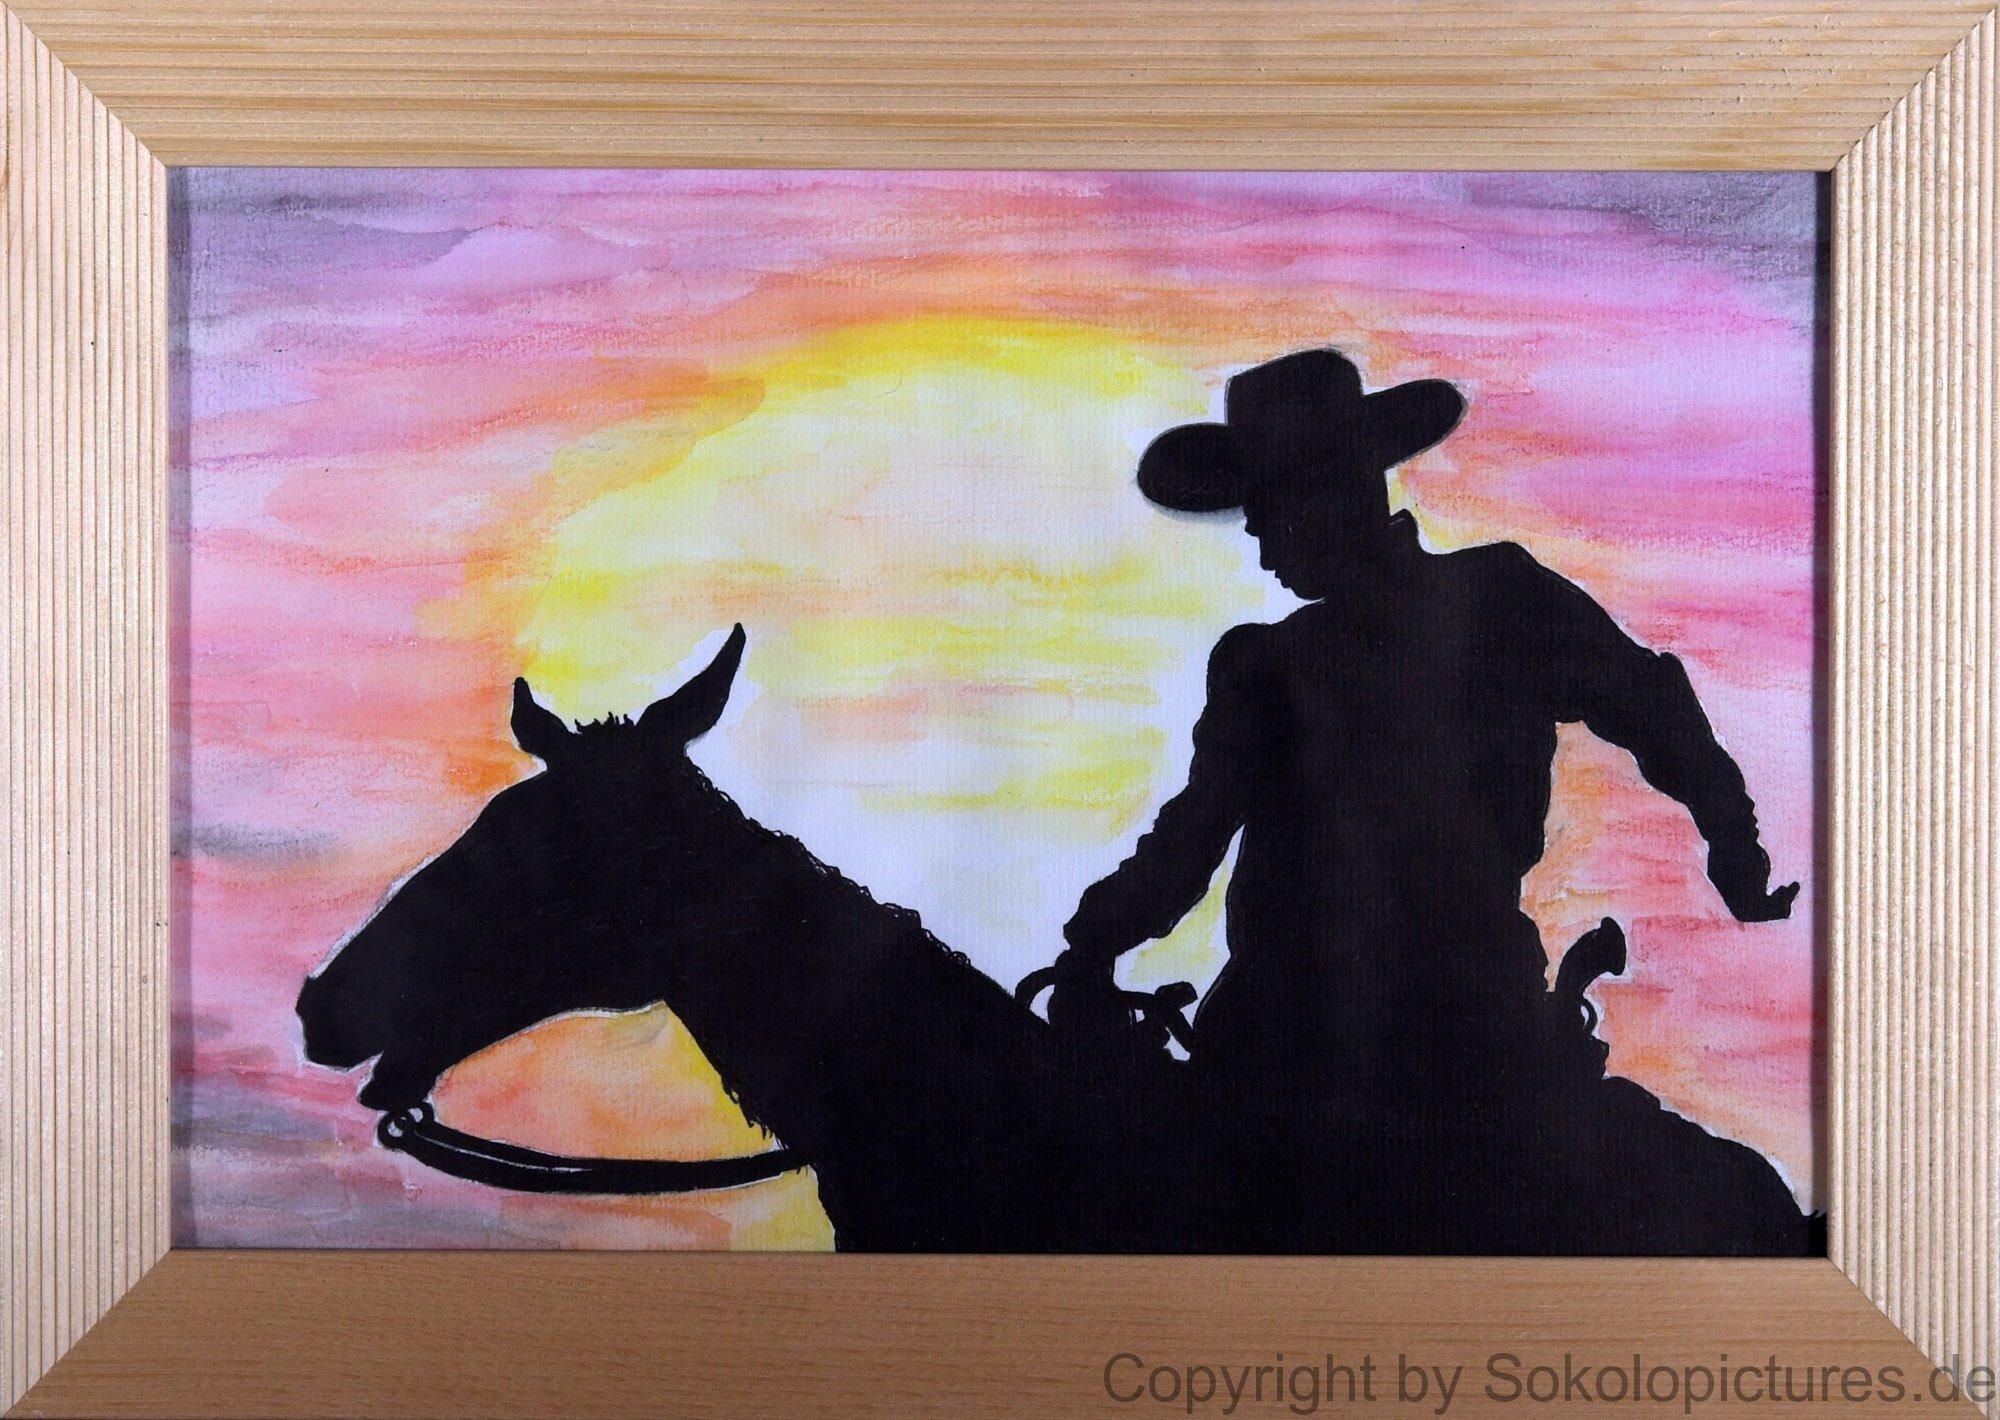 Haiticowboy1